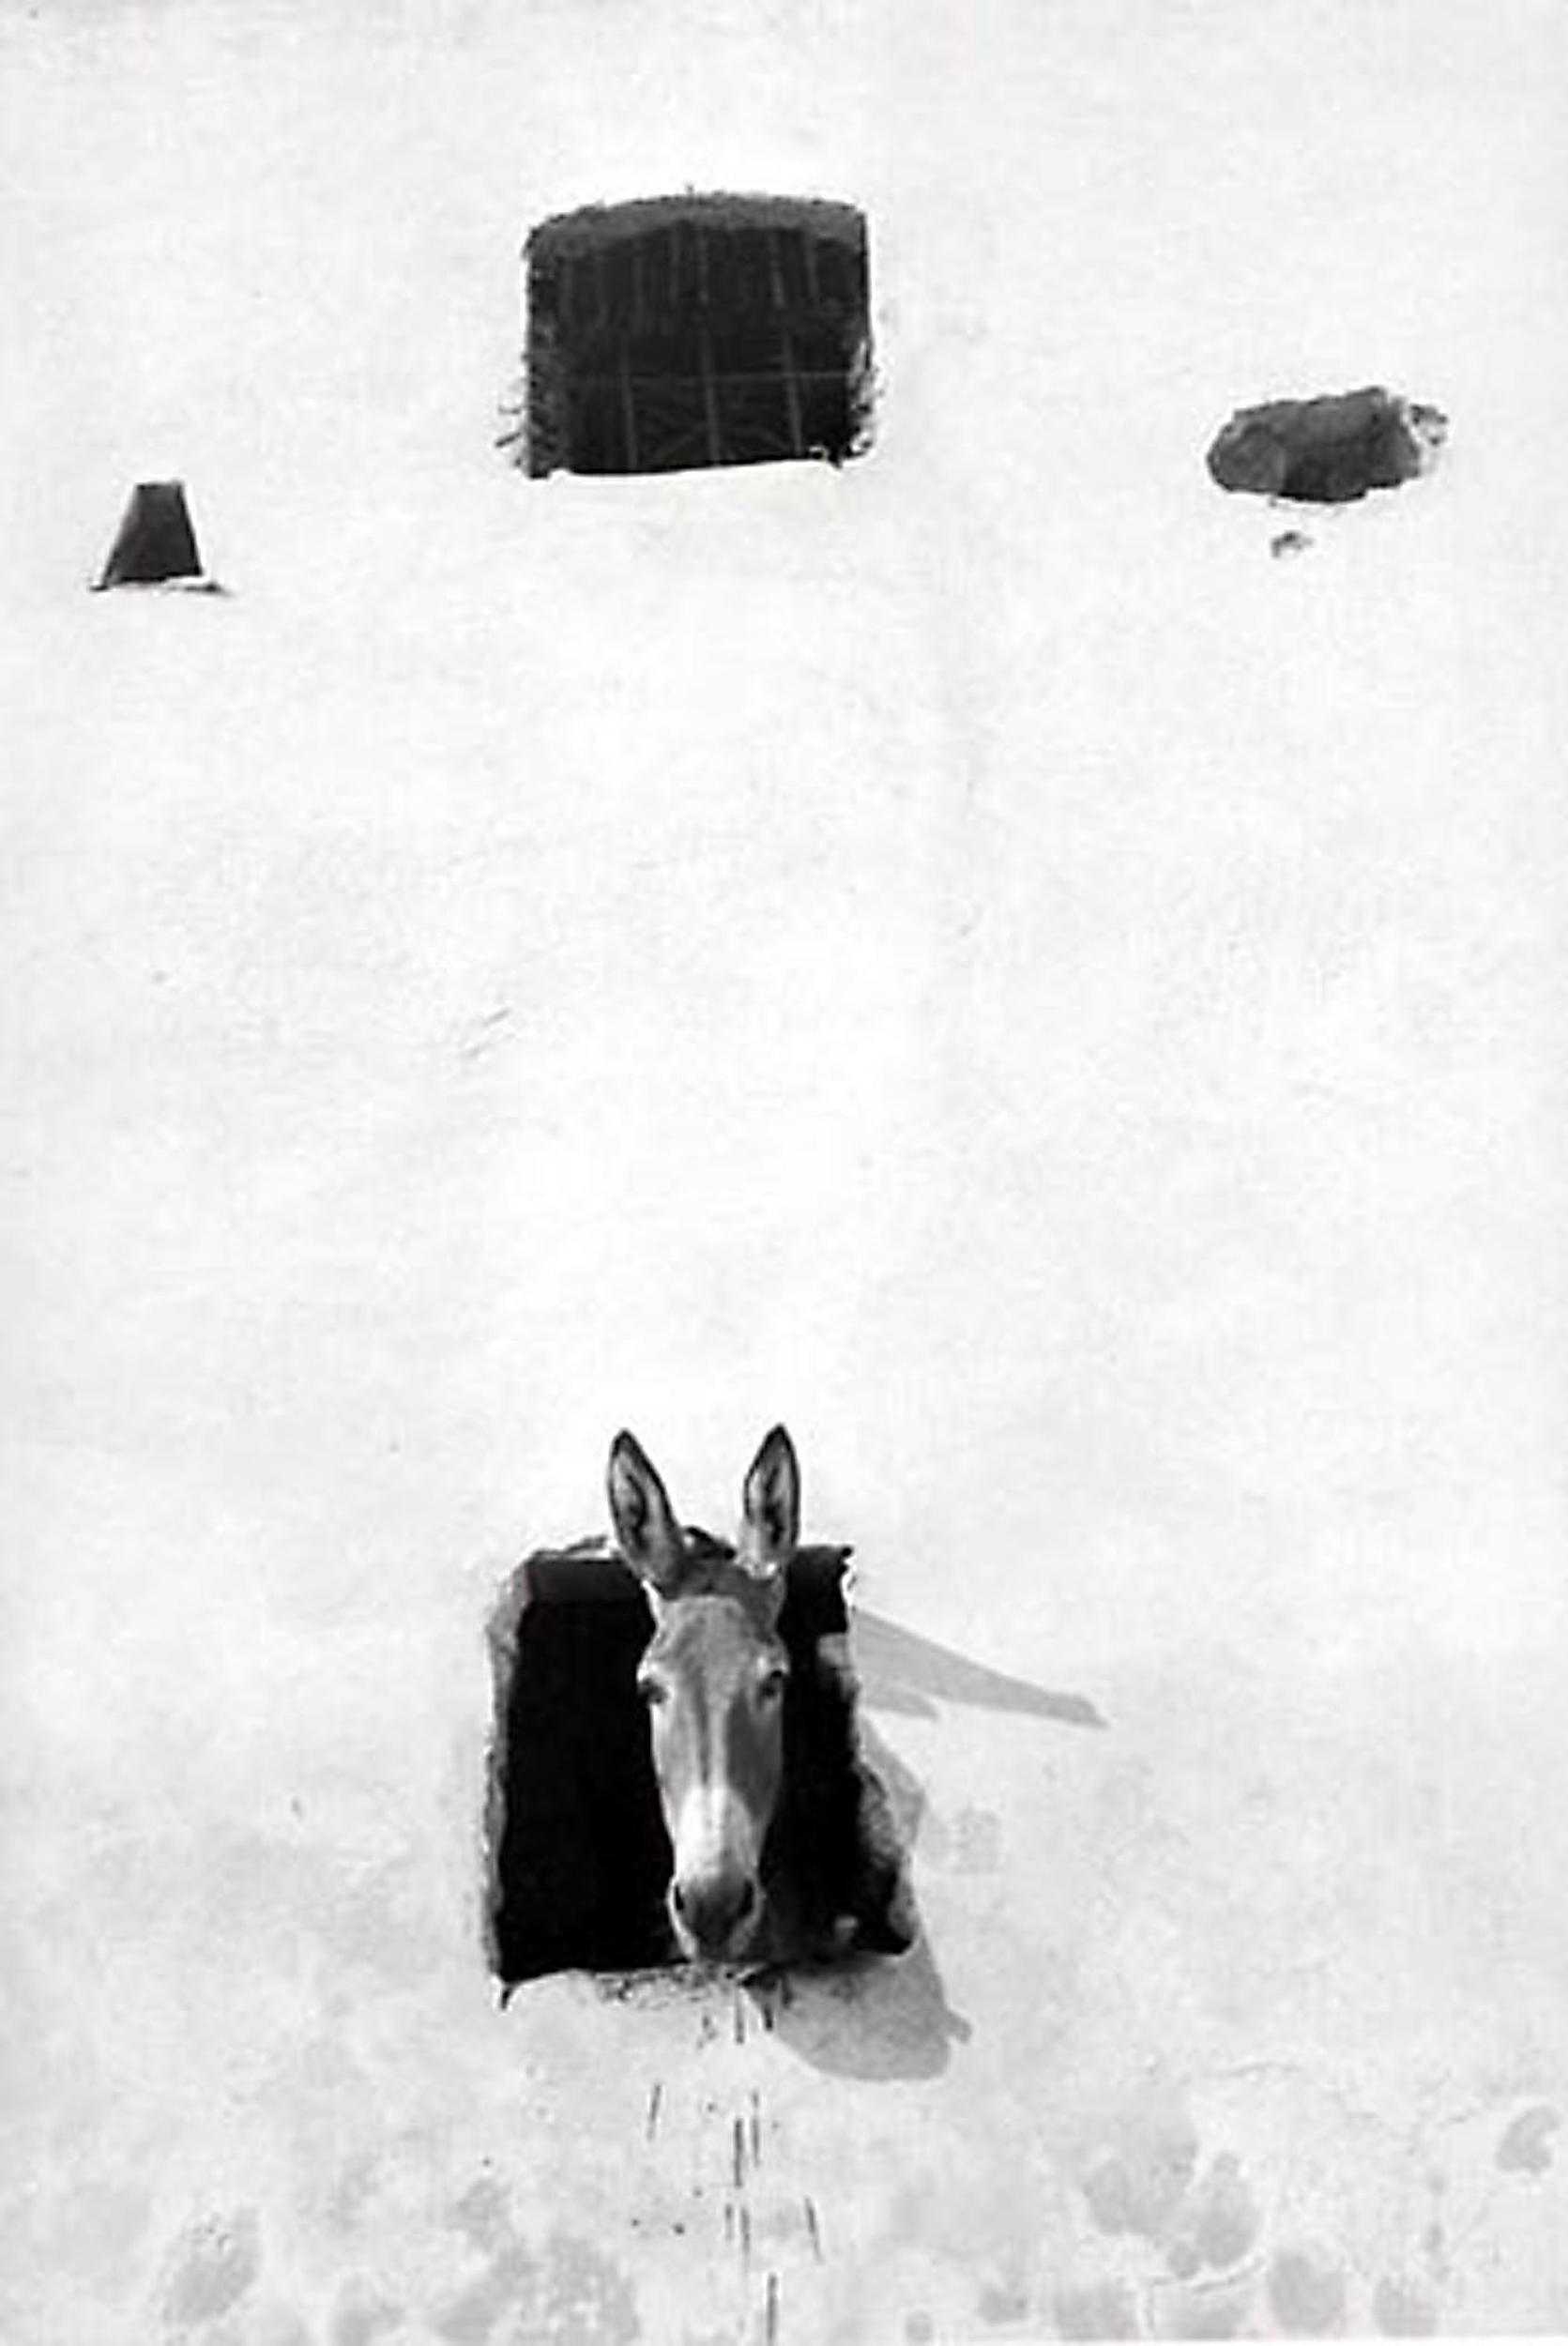 HANNON_donkey_in_window_(elba_italy)_1958_p11x14_high.jpg